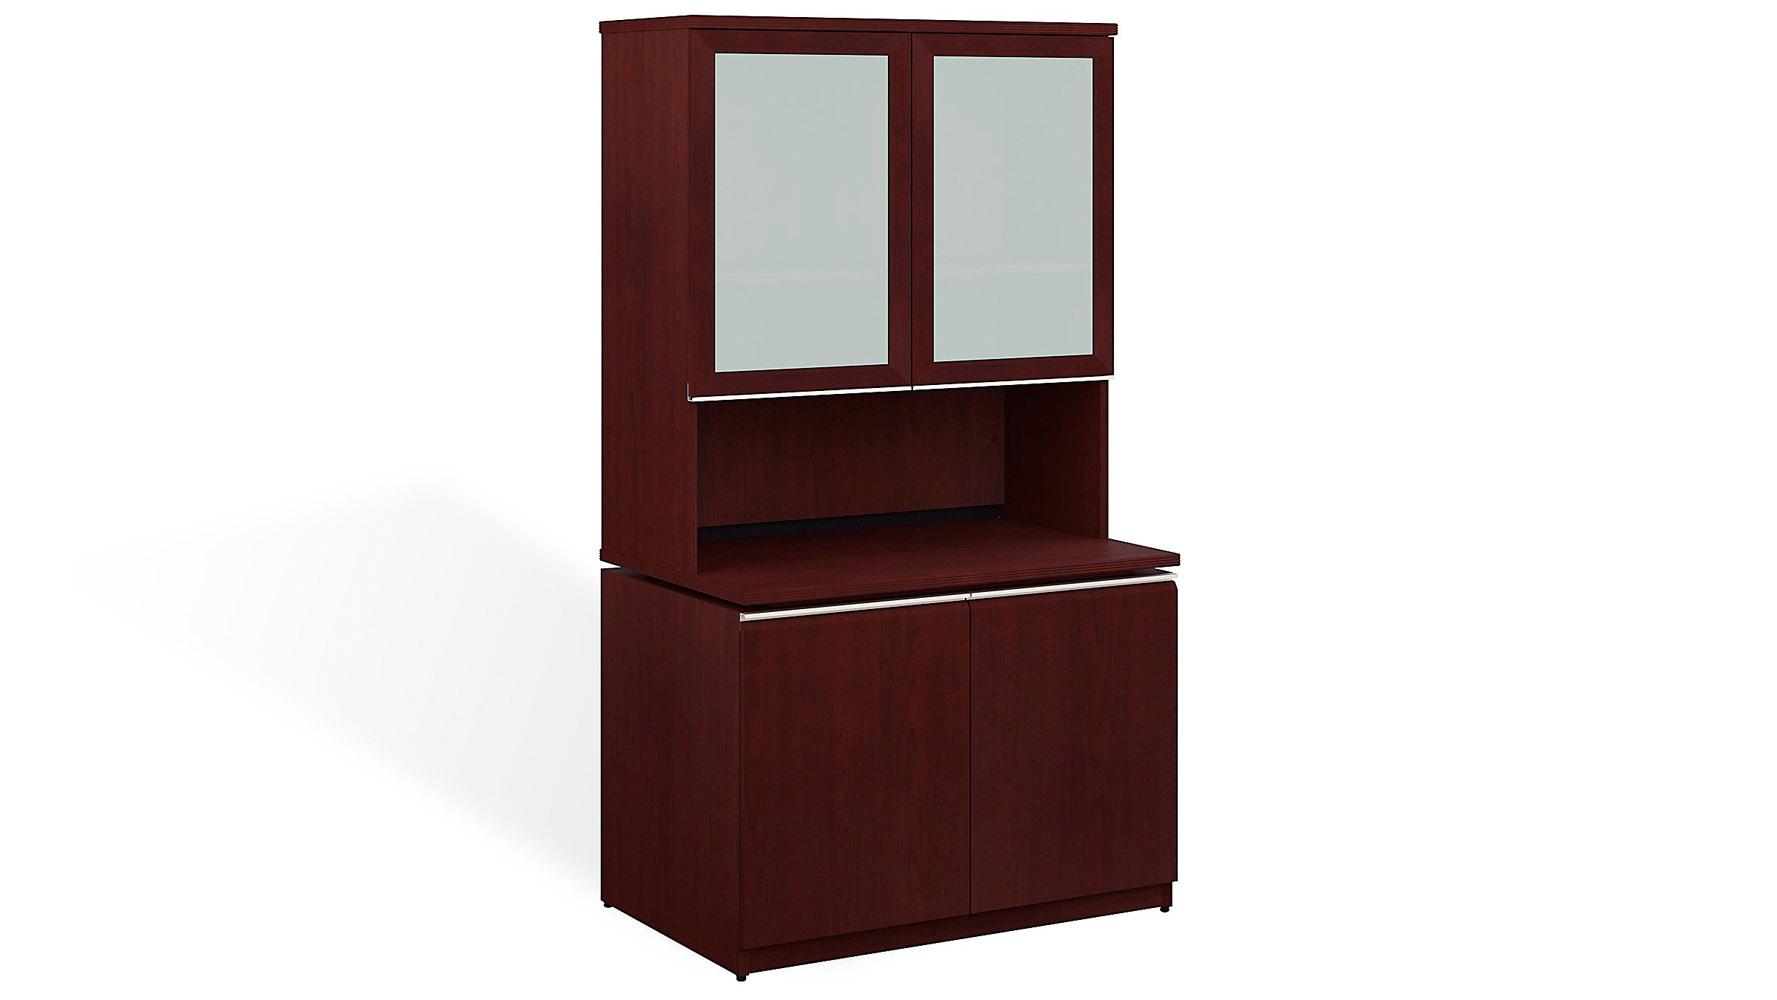 Bbf Milano Bookcase Hutch With Glass Doors Zuri Furniture